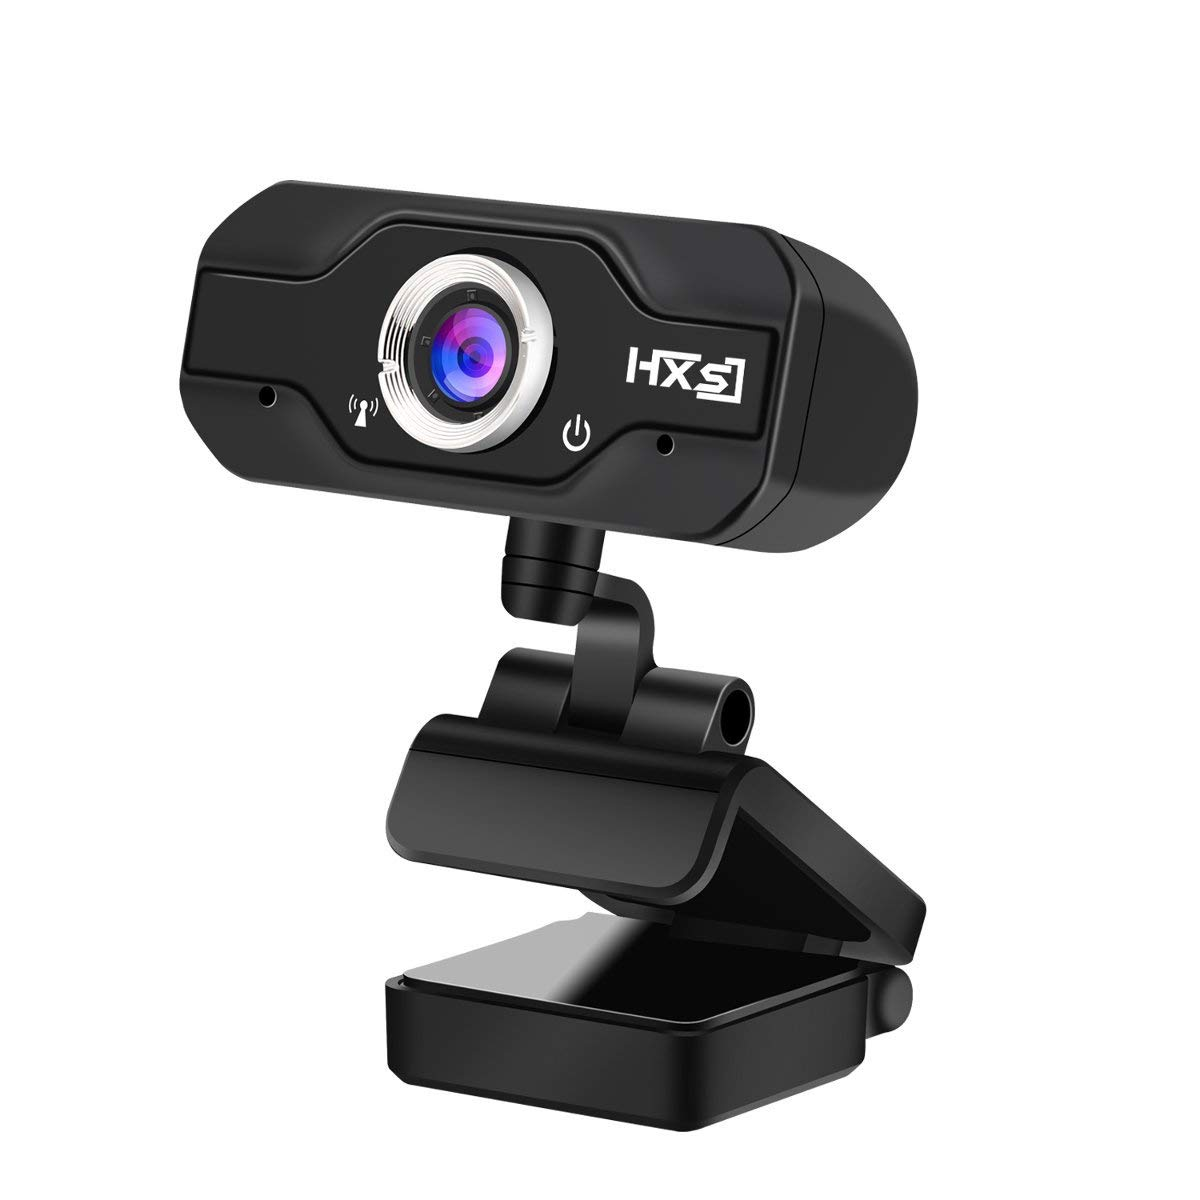 Amazon Com 720p Hd Webcam Inteching Usb Widescreen Computer Camera With Microphone For Windows Xp Vista 7 8 8 1 10 Pc Desktop Or Laptop Livestream Skype Cam Computers Accessories